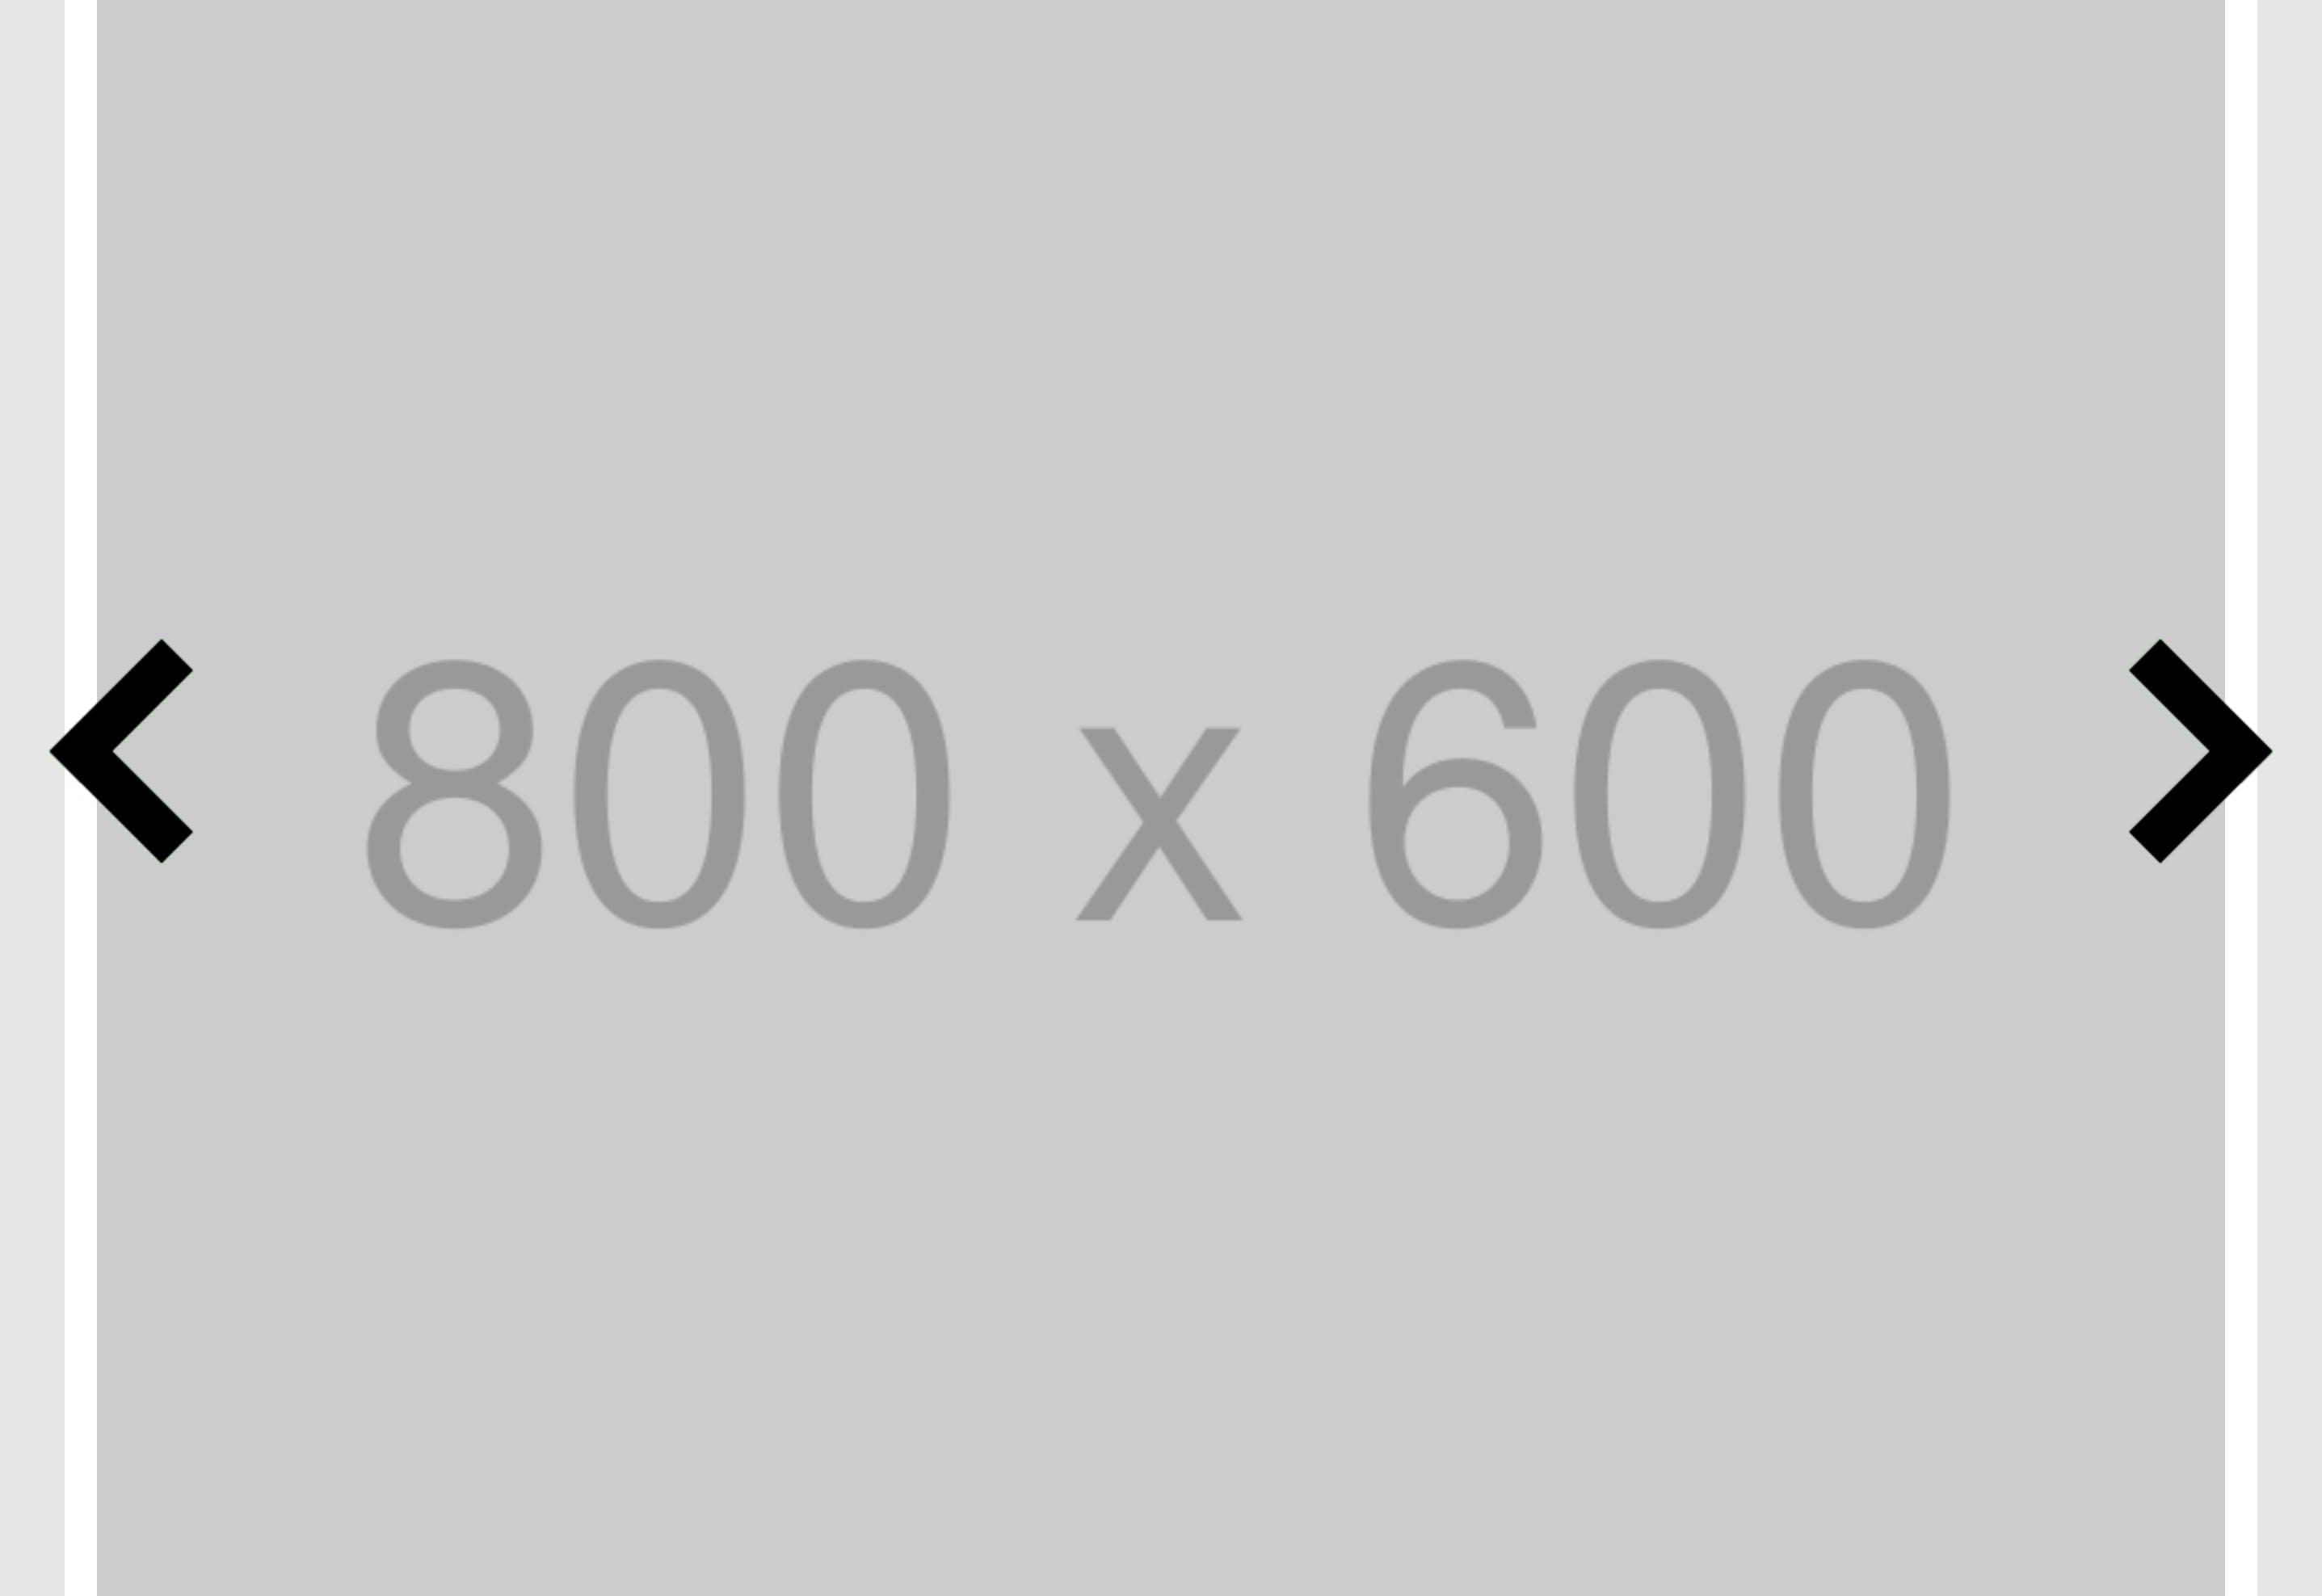 screencapture-127-0-0-1-5500-index-html-2019-09-08-15_15_19.png